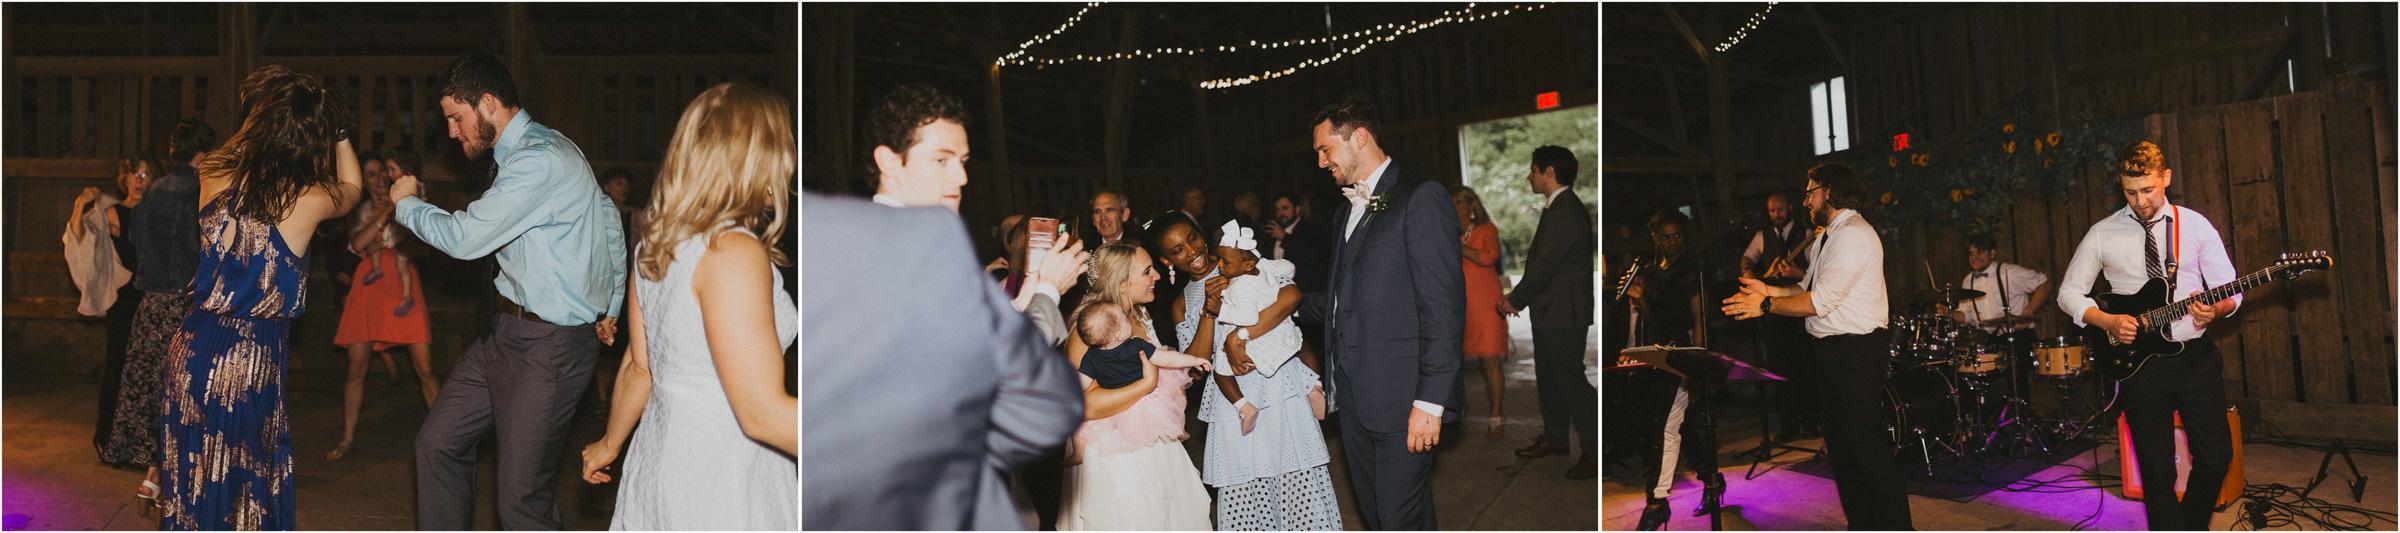 alyssa barletter photography nelson wedding nebraska city lied lodge morton barn spring wedding photographer-63.jpg